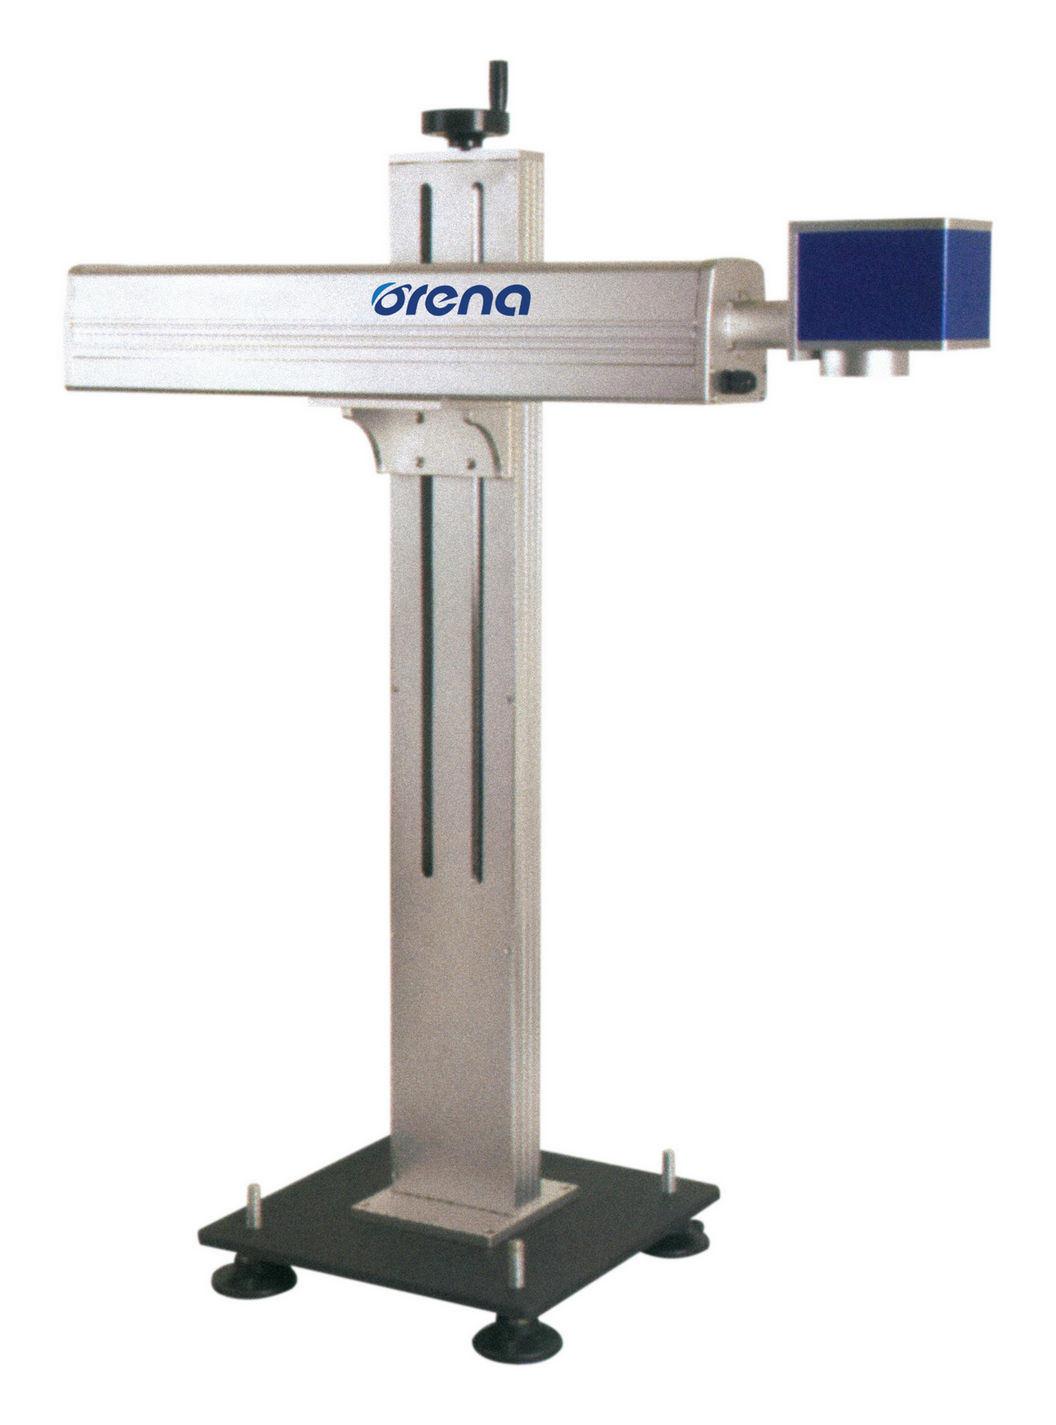 Co2 Laser Marking Machine Obg Flm 20w China Fiber